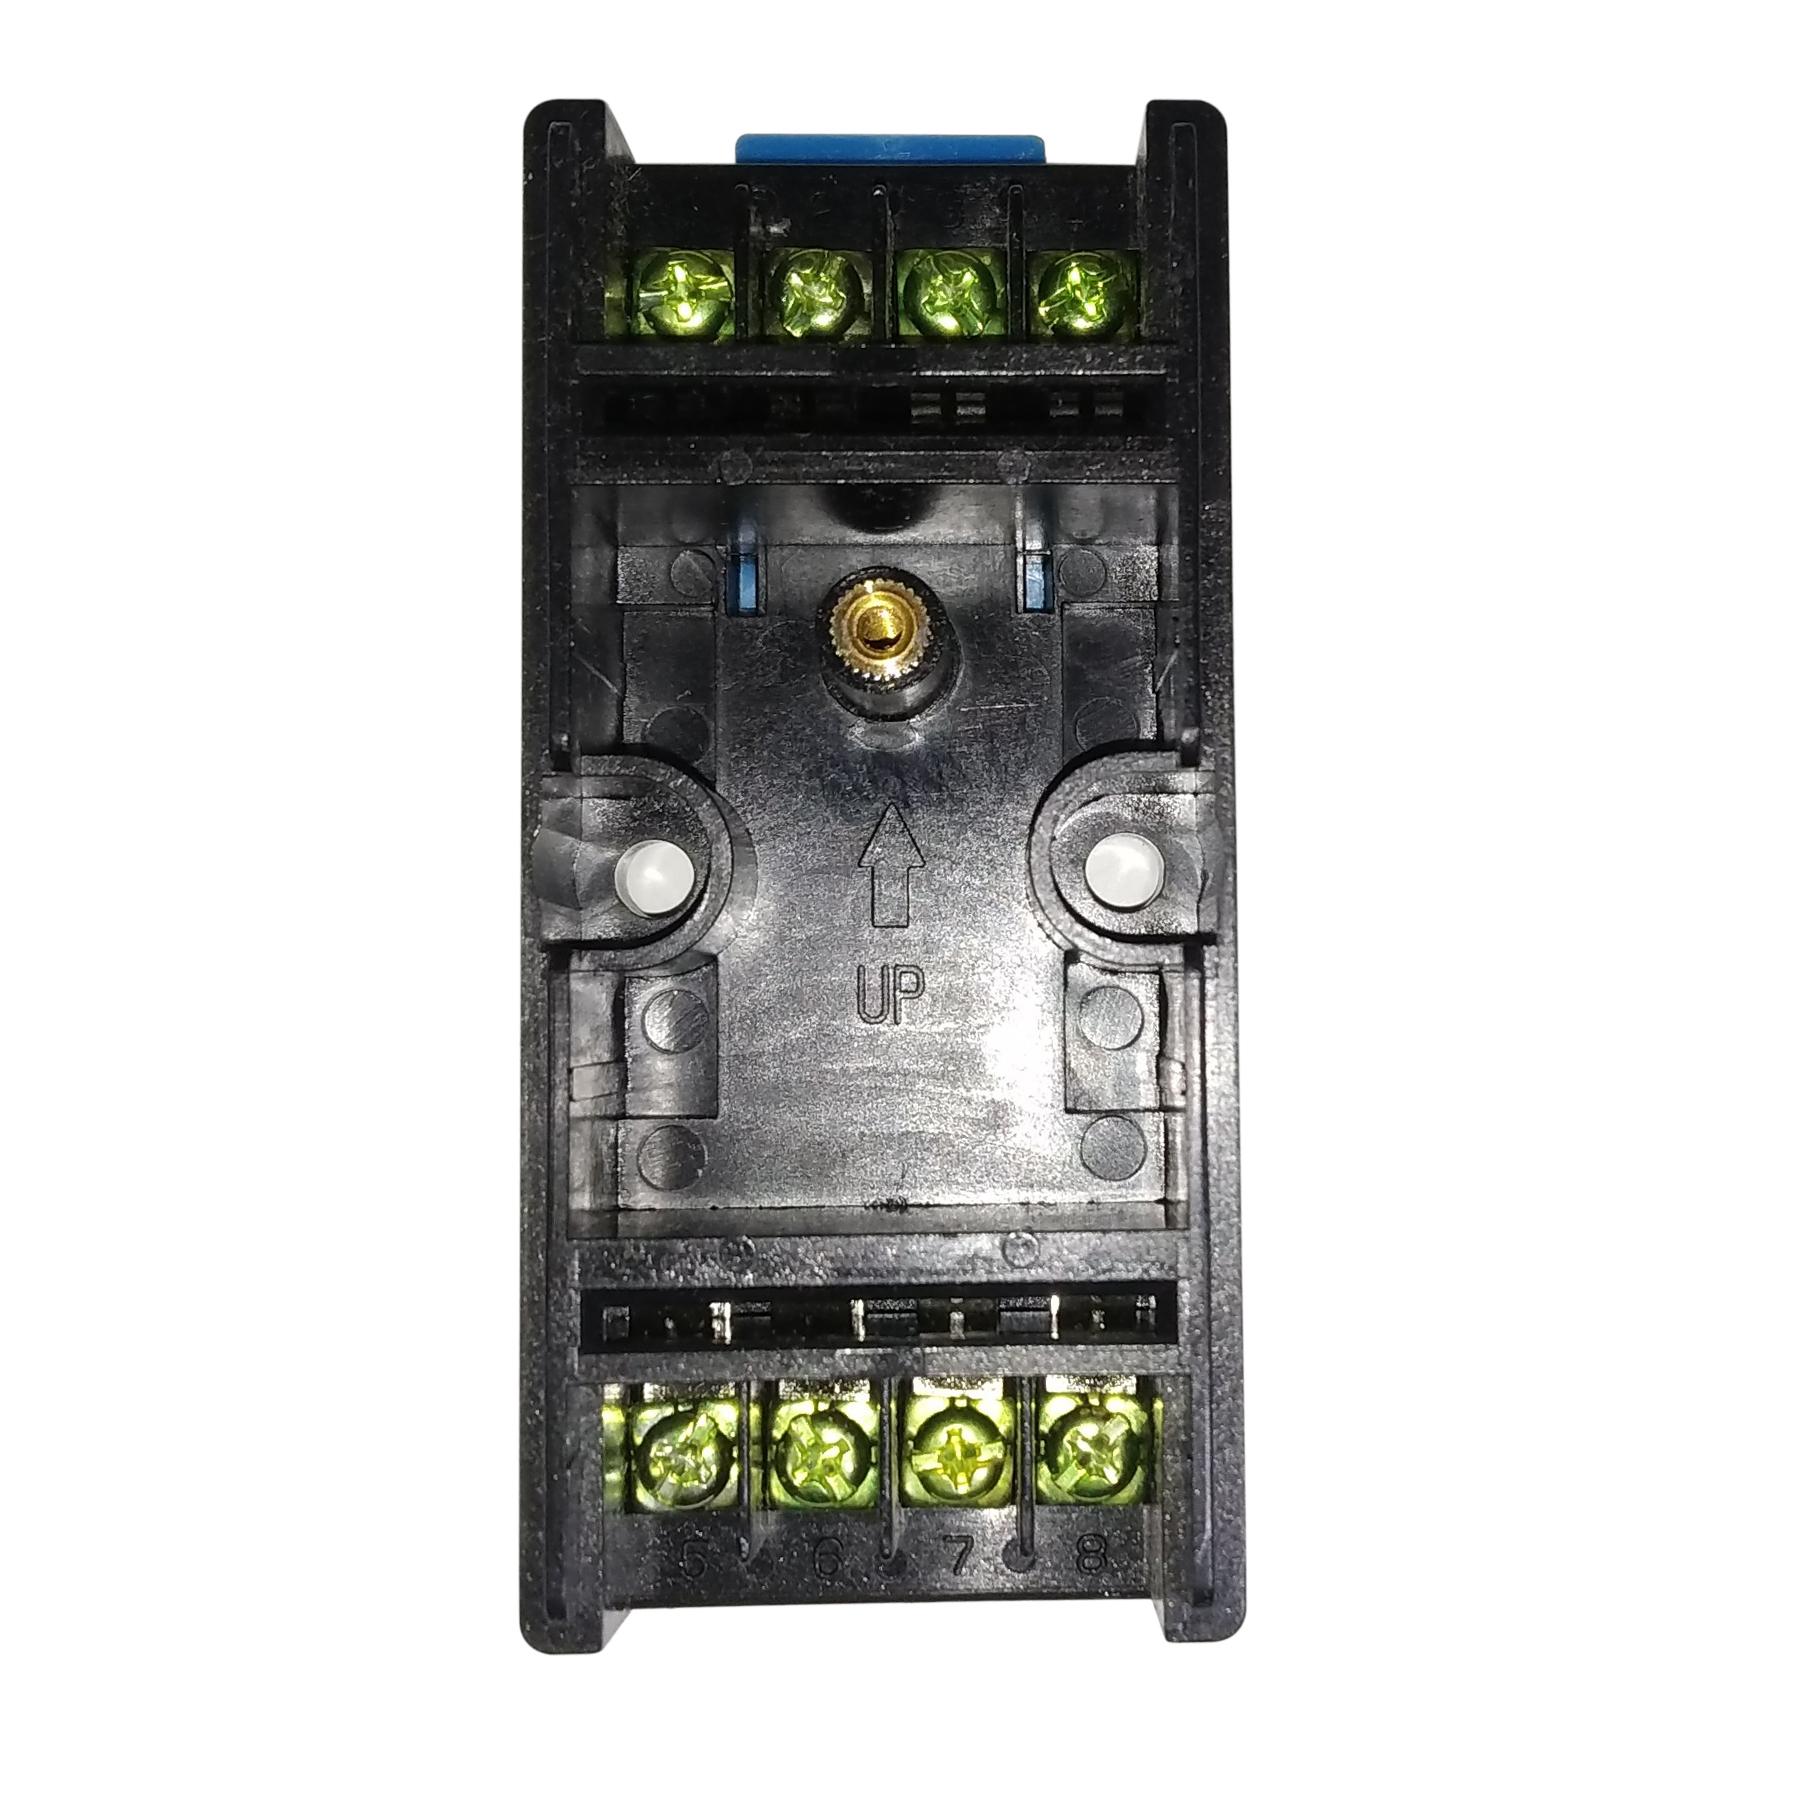 Honeywell flame switch BC1000A0220U/E